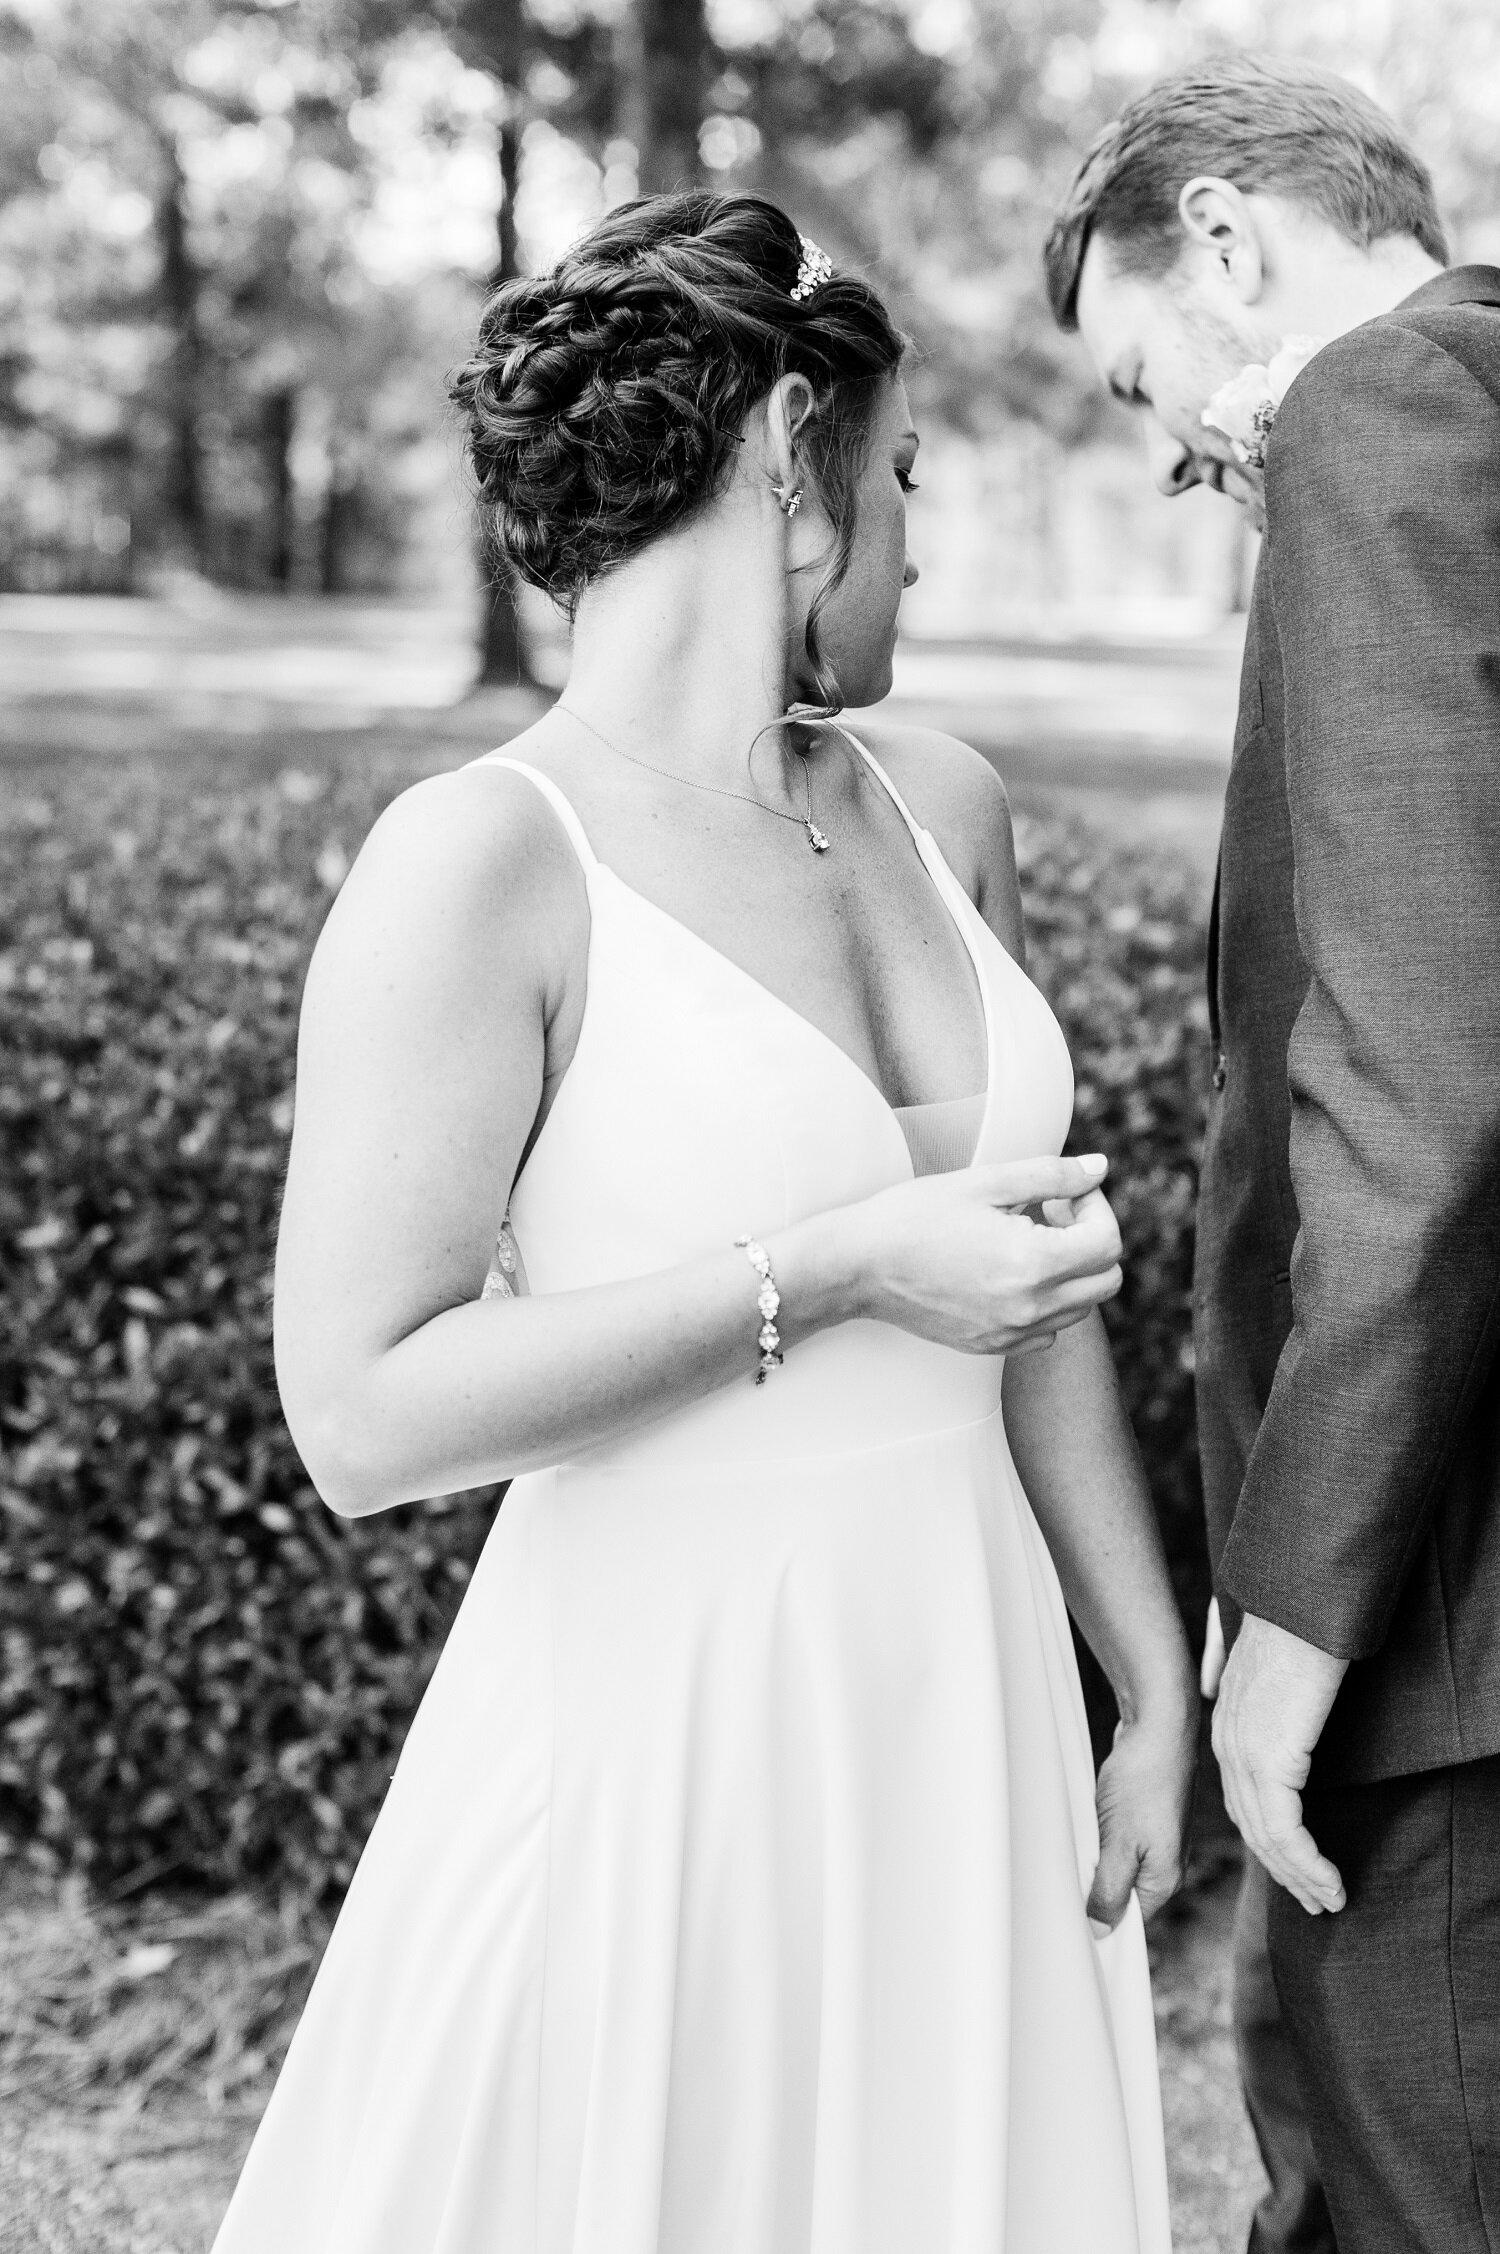 Gamberi Wedding - Shea's Favorites 3_-8.jpg